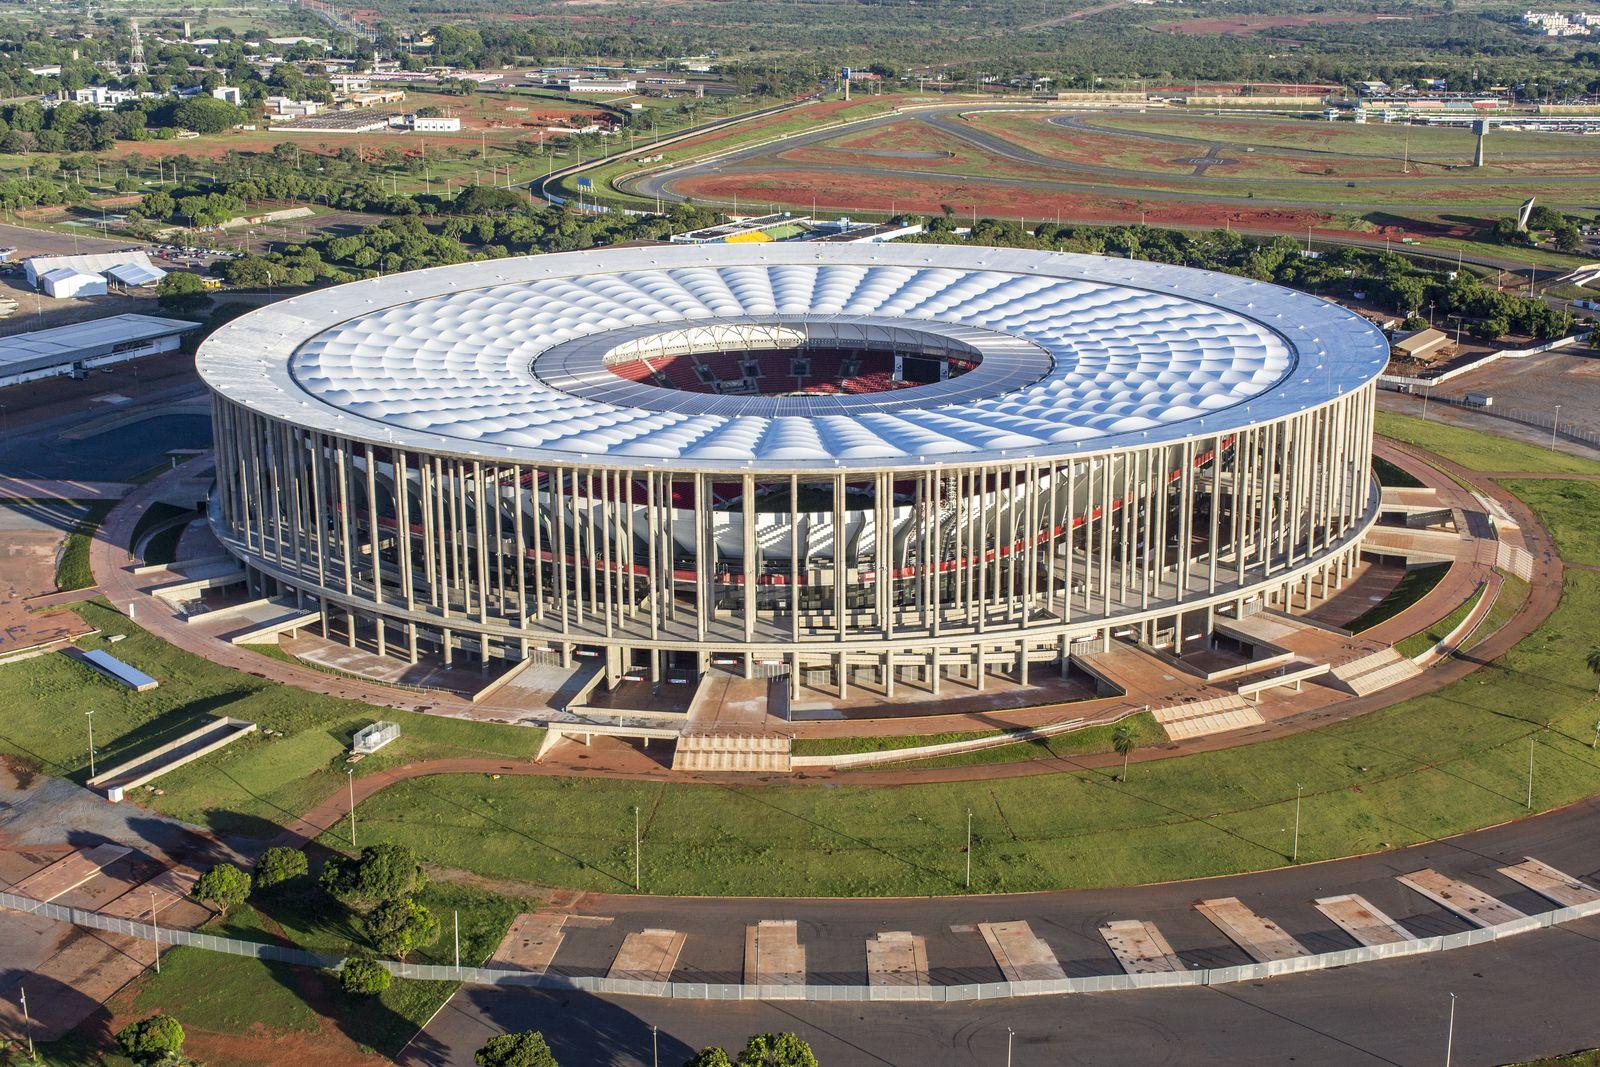 Nacional: World Cup 2014: Estadio Nacional De Brasilia